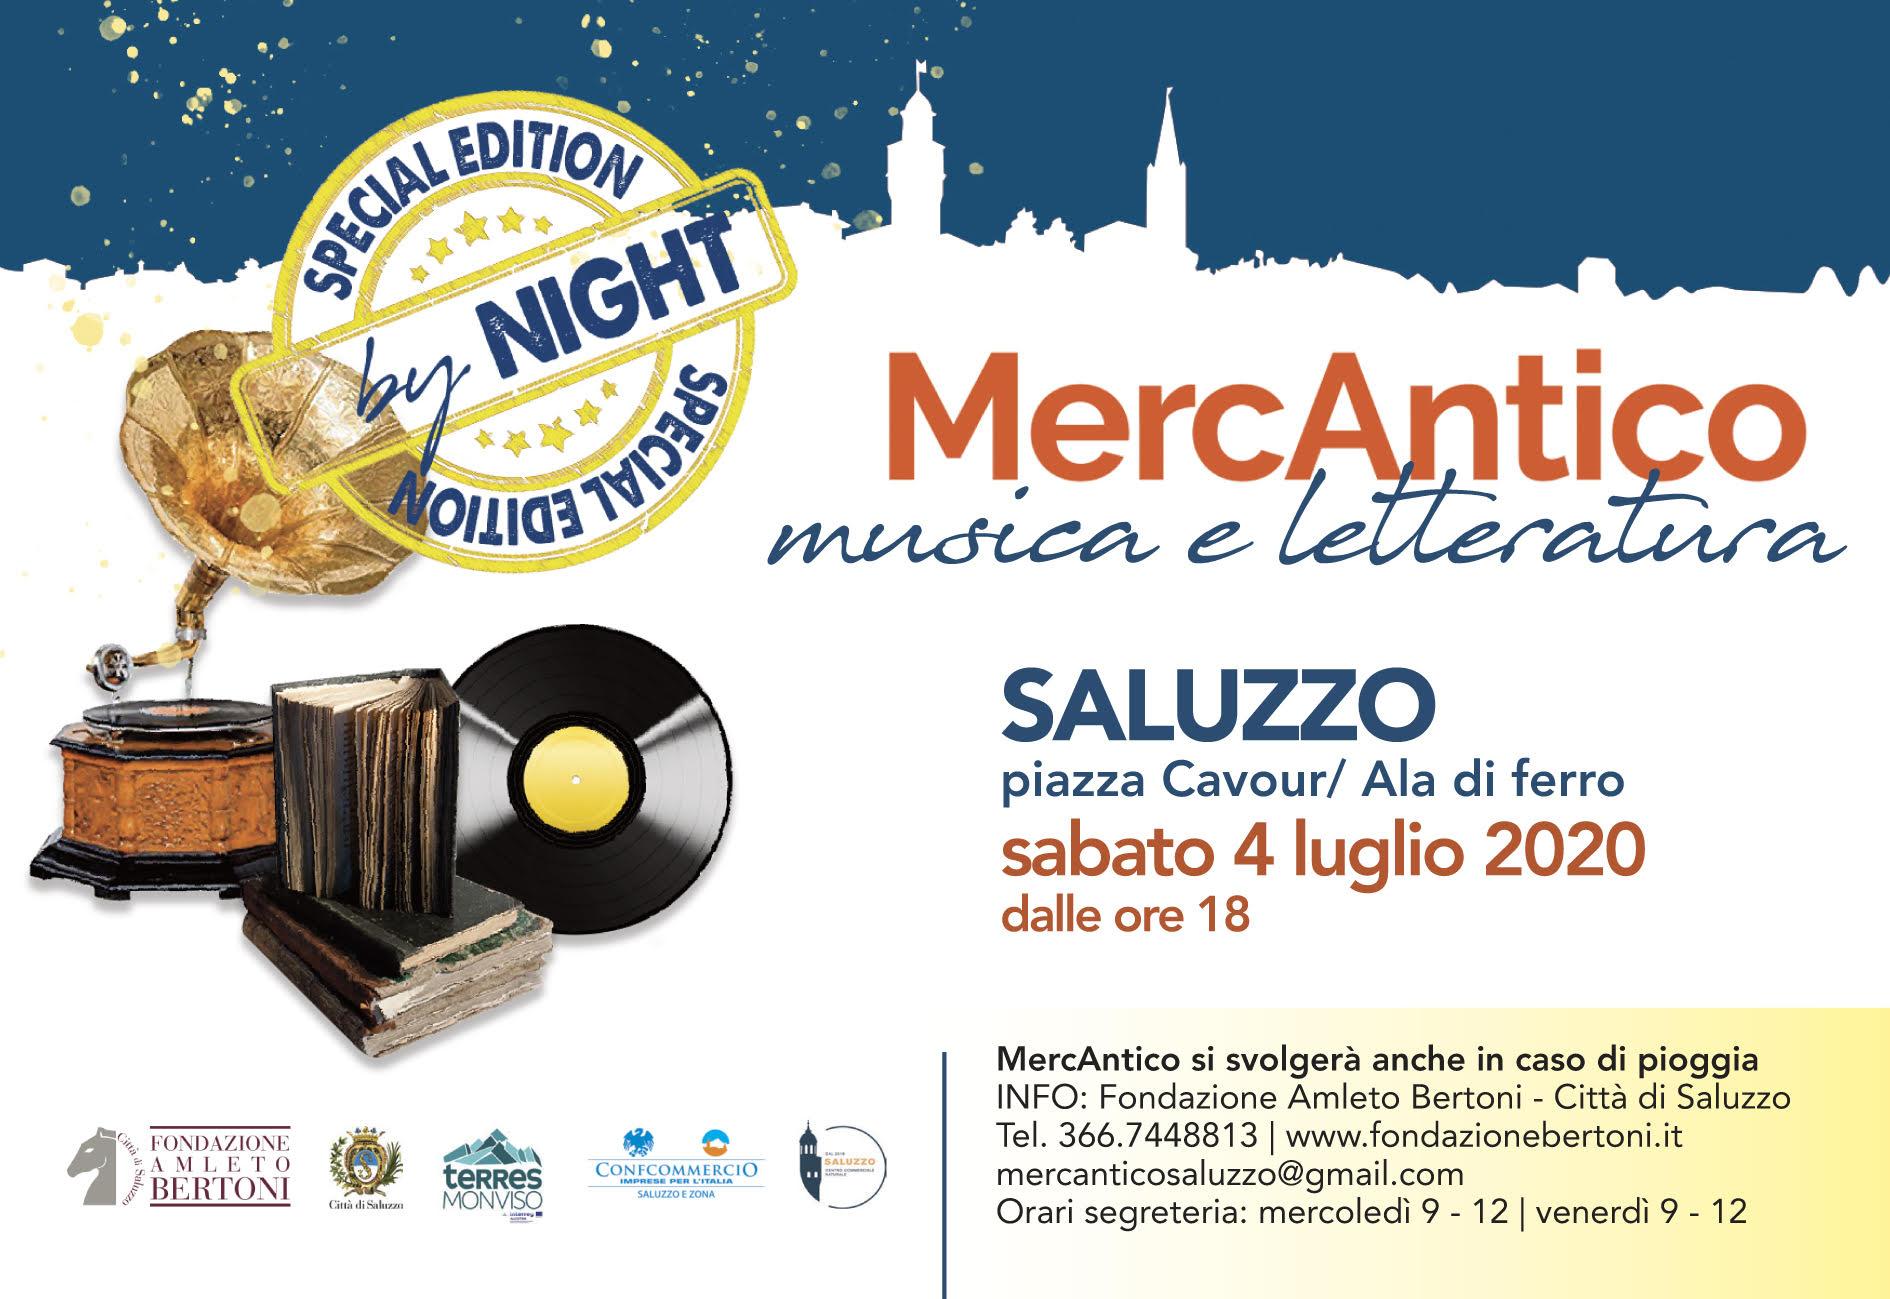 MercAntico by night!